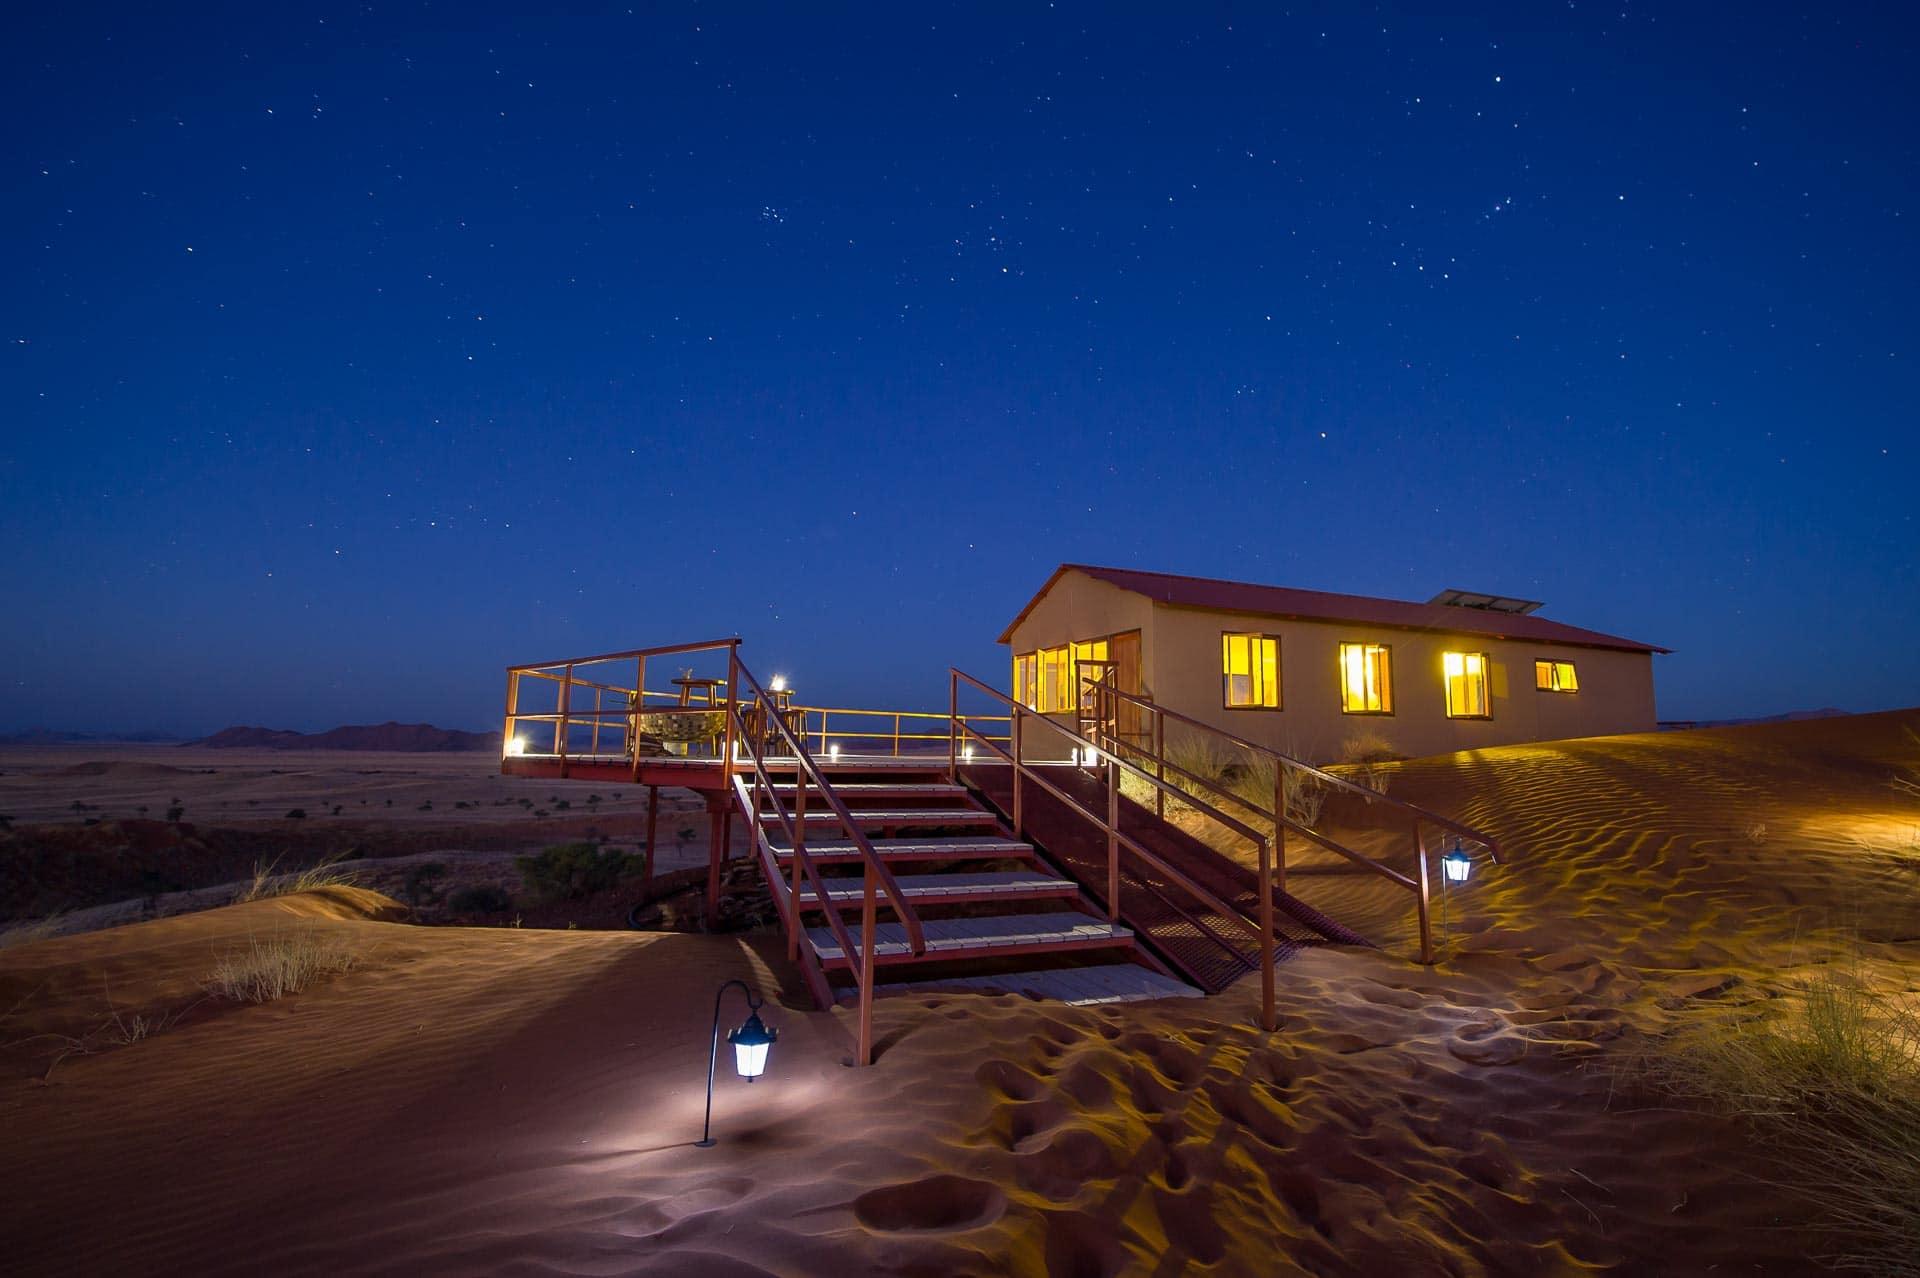 Namib-Dune-Star-Camp-9